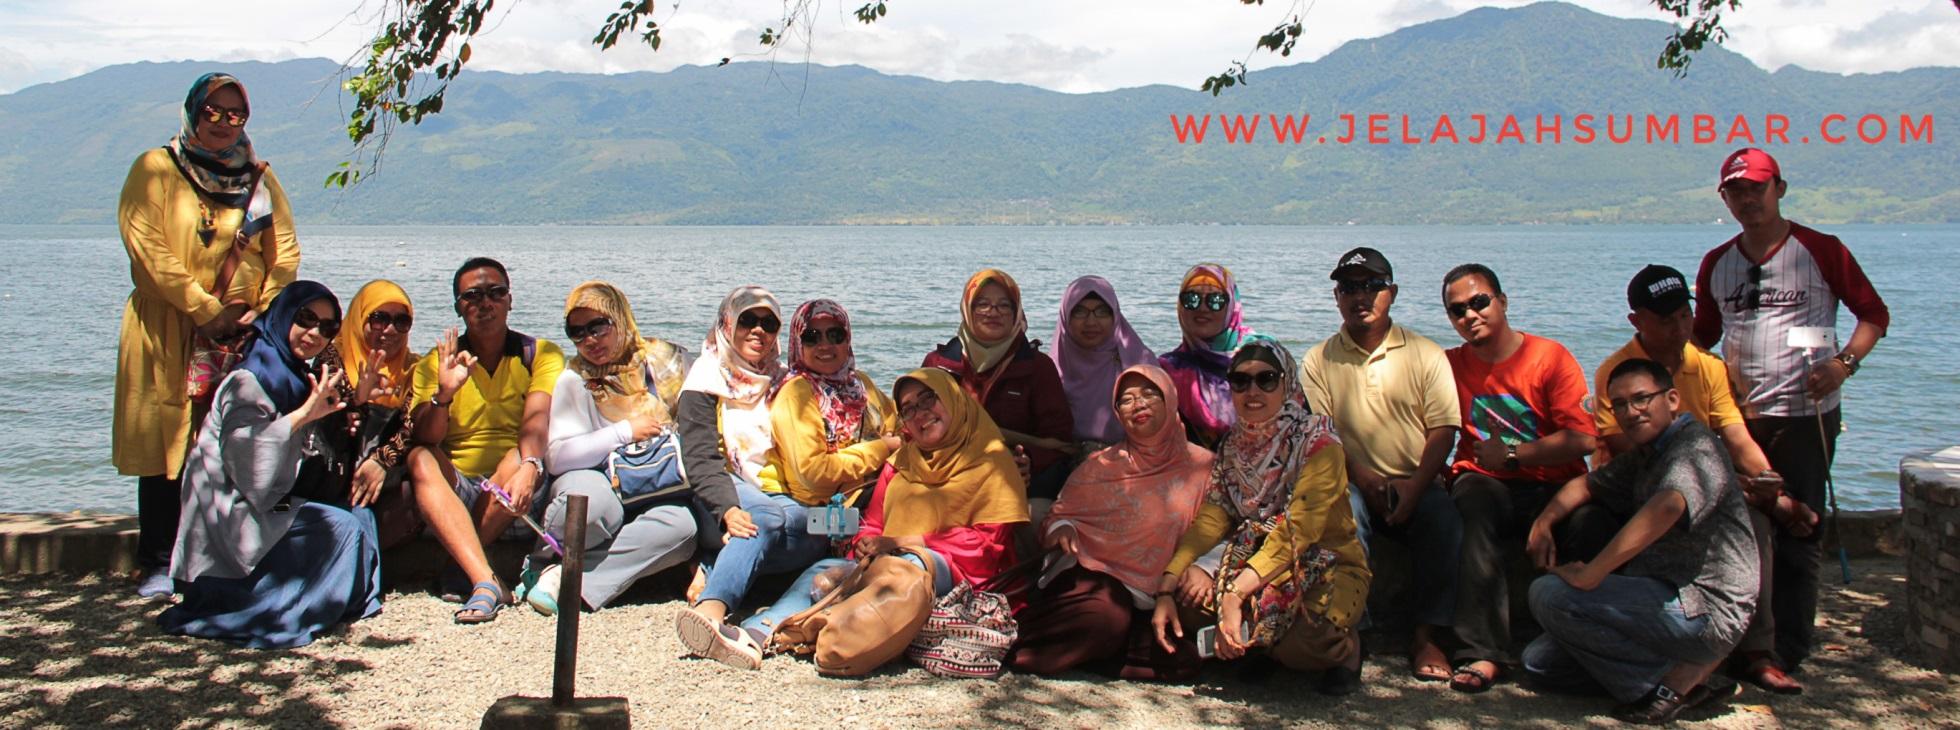 Paket Tour Padang Danau Kembar – Bukittinggi 2D1N D